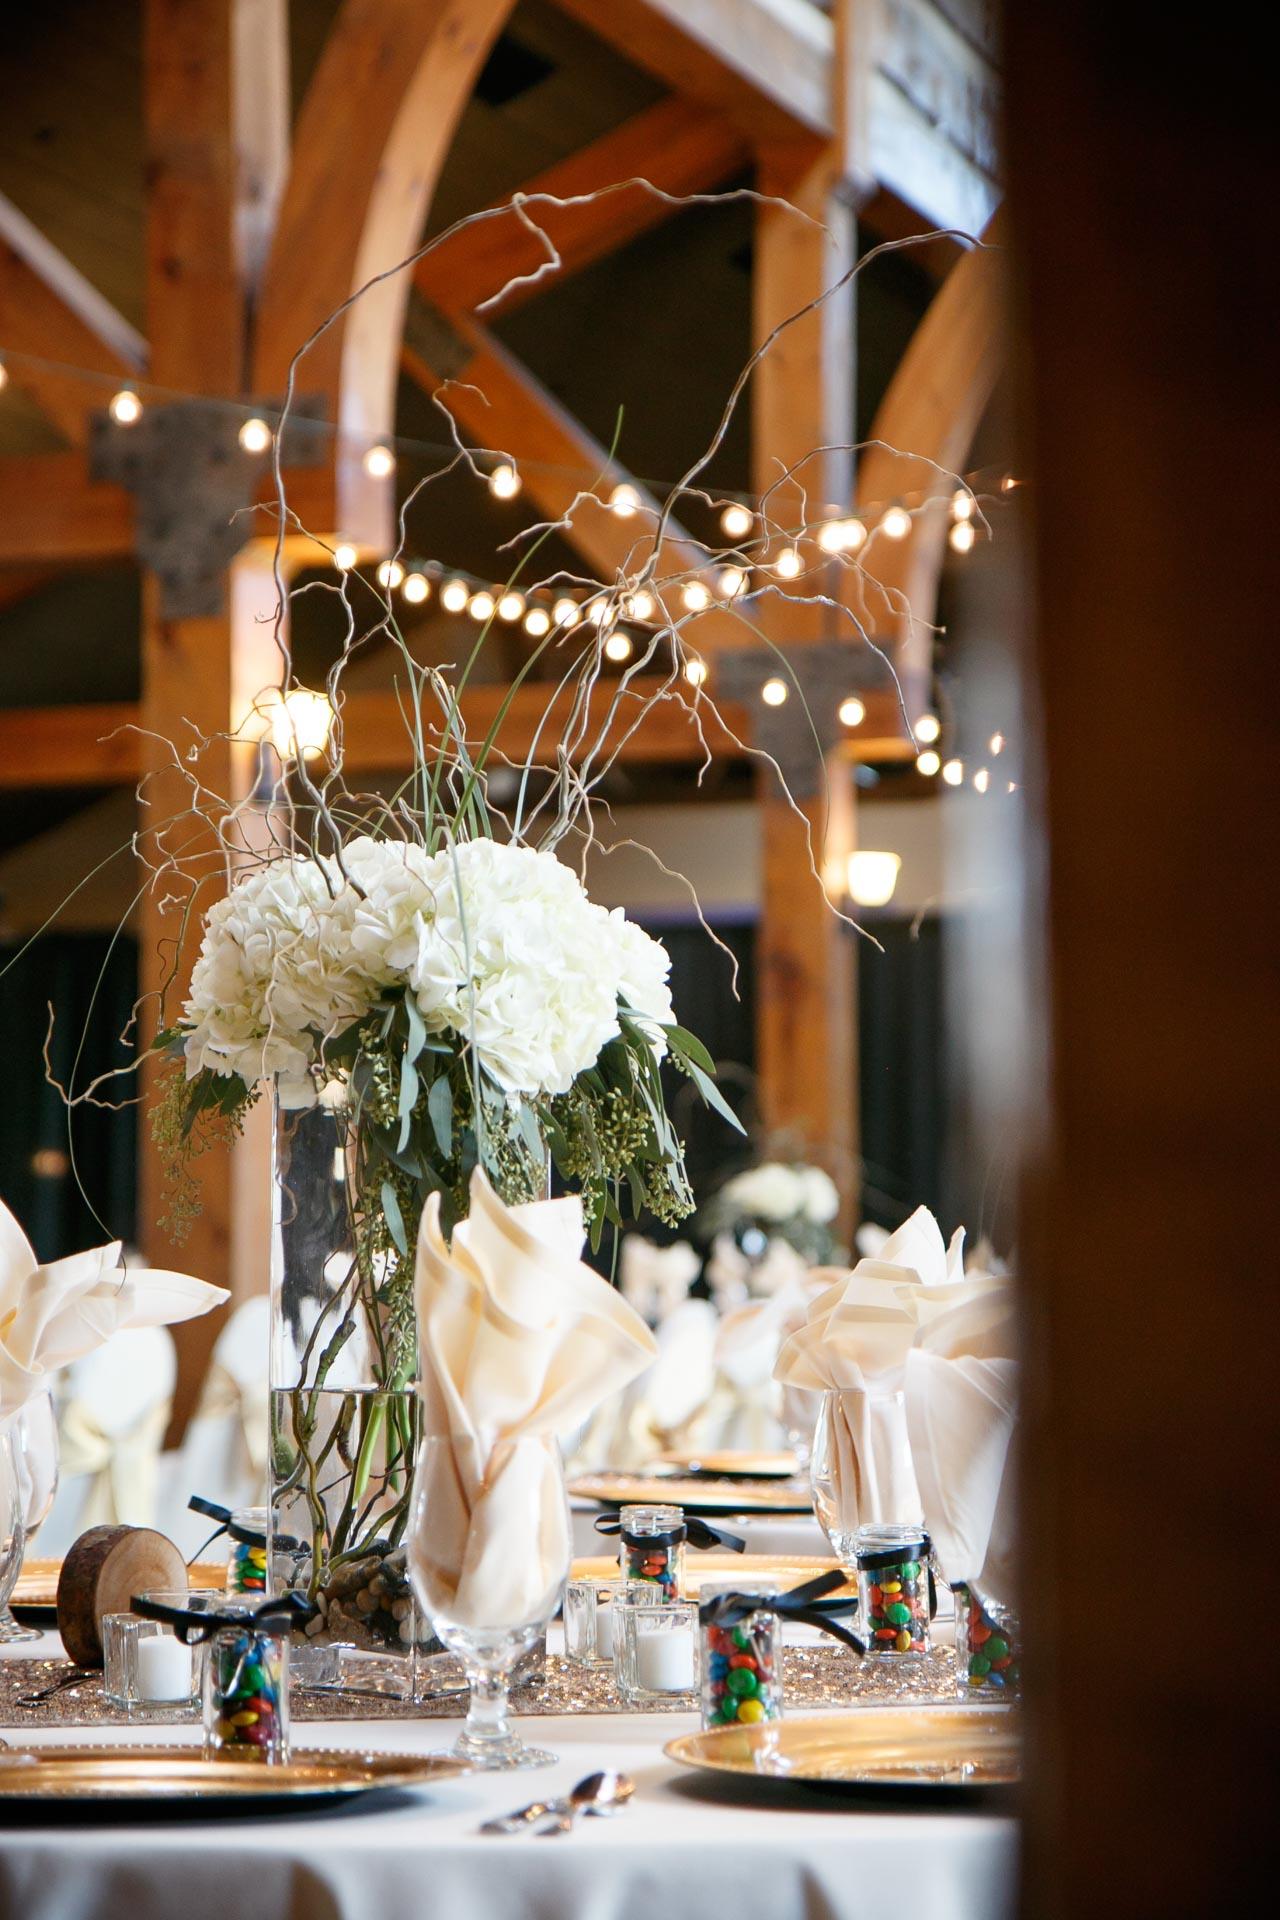 wedding-2-adam-shea-photography-green-bay-appleton-neenah-photographer-32.jpg